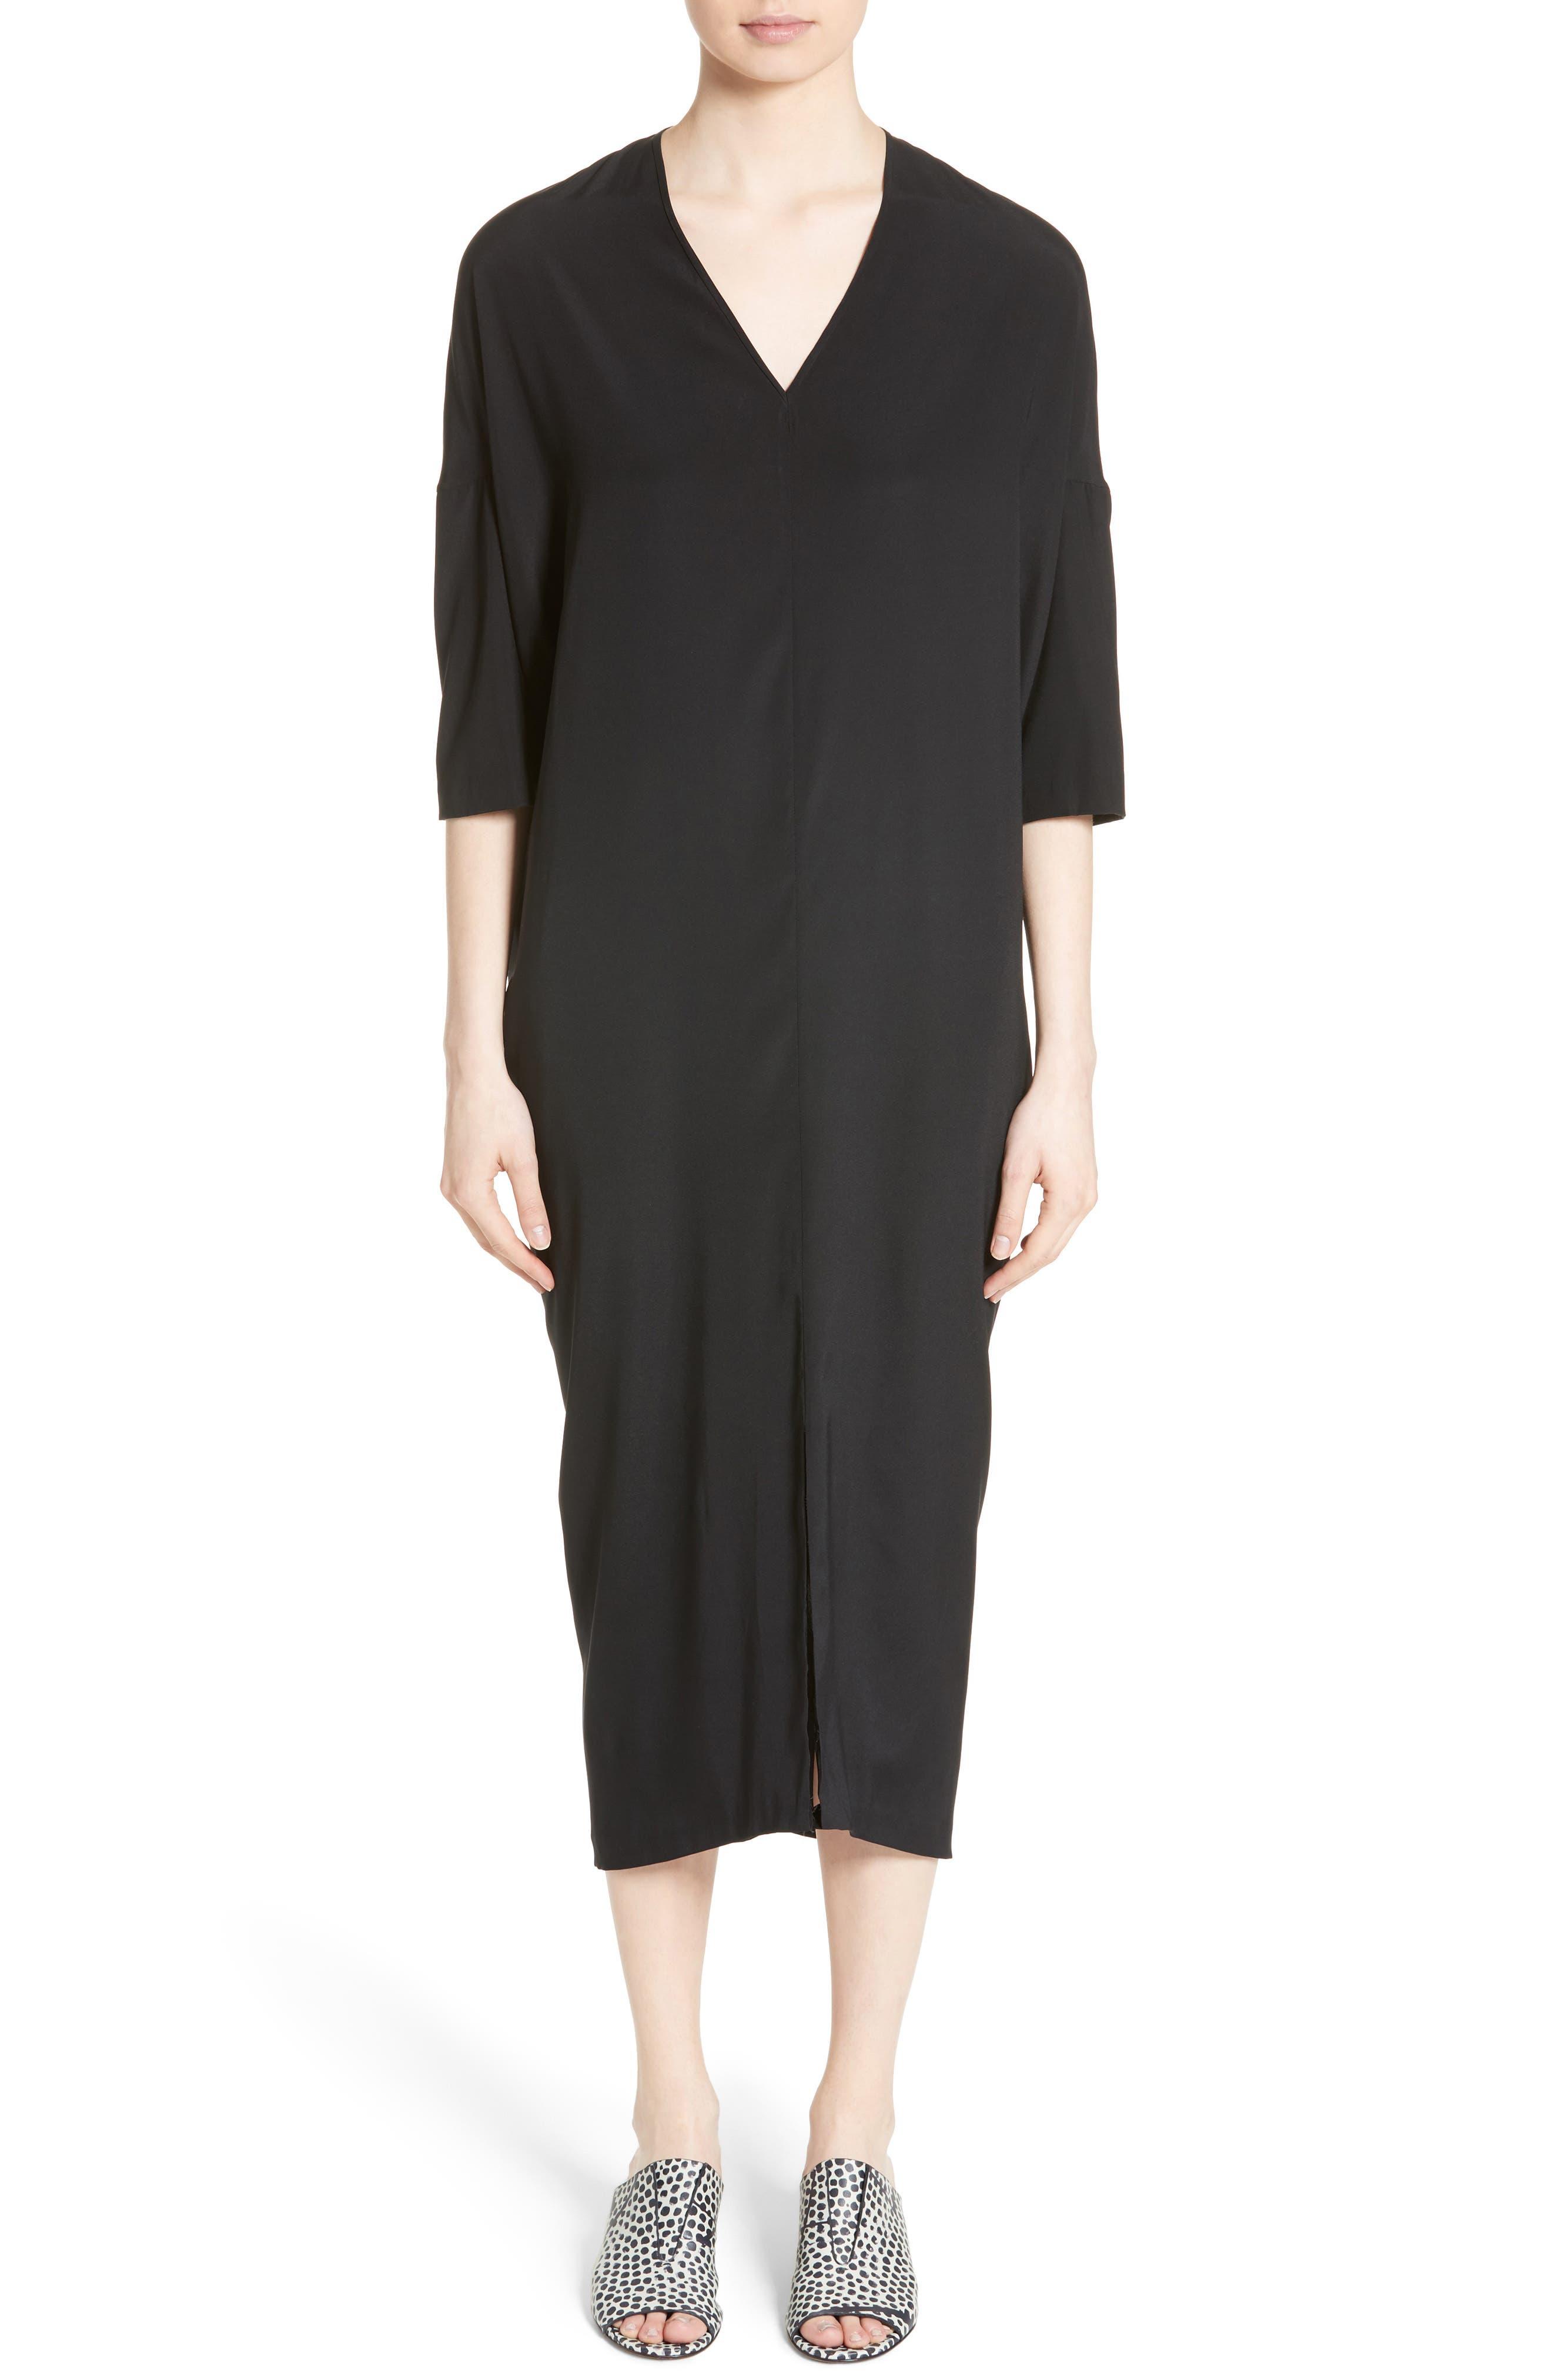 Koya Stretch Silk Charmeuse Dress,                             Main thumbnail 1, color,                             001